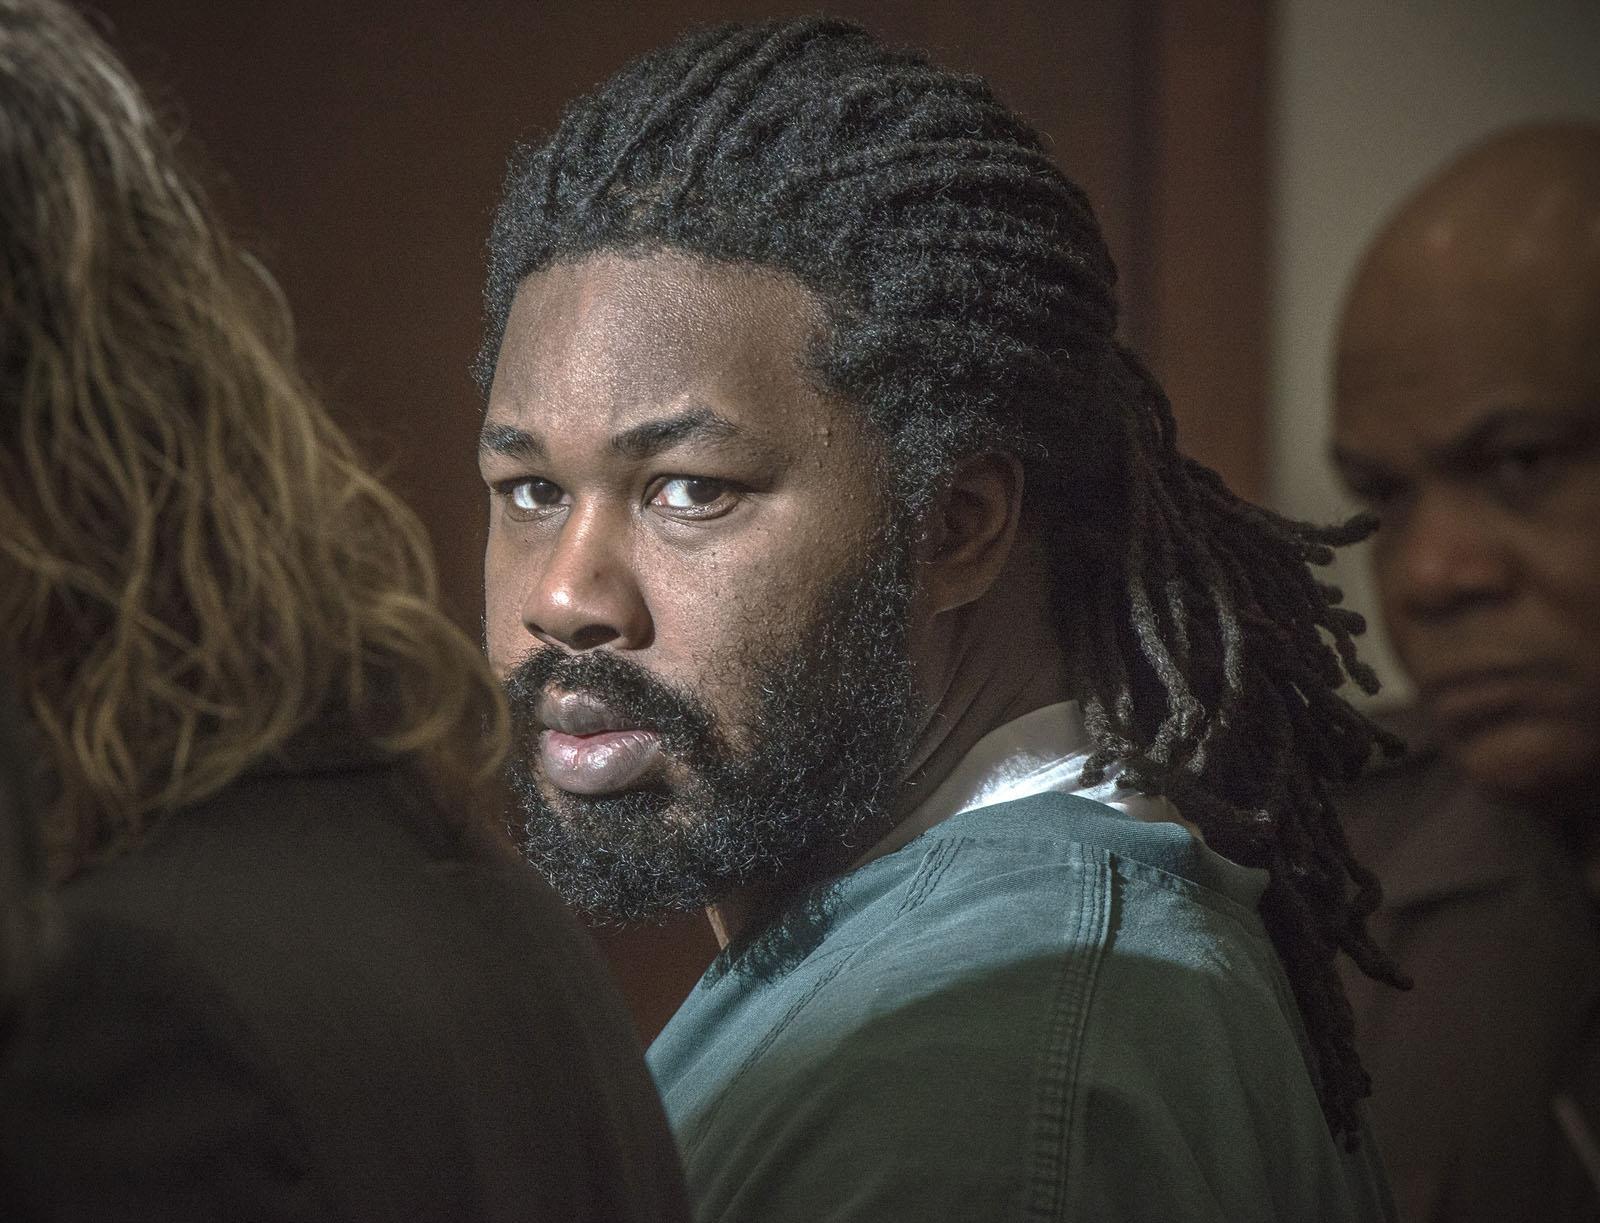 Judge hearing motions in Jesse Matthew murder trial